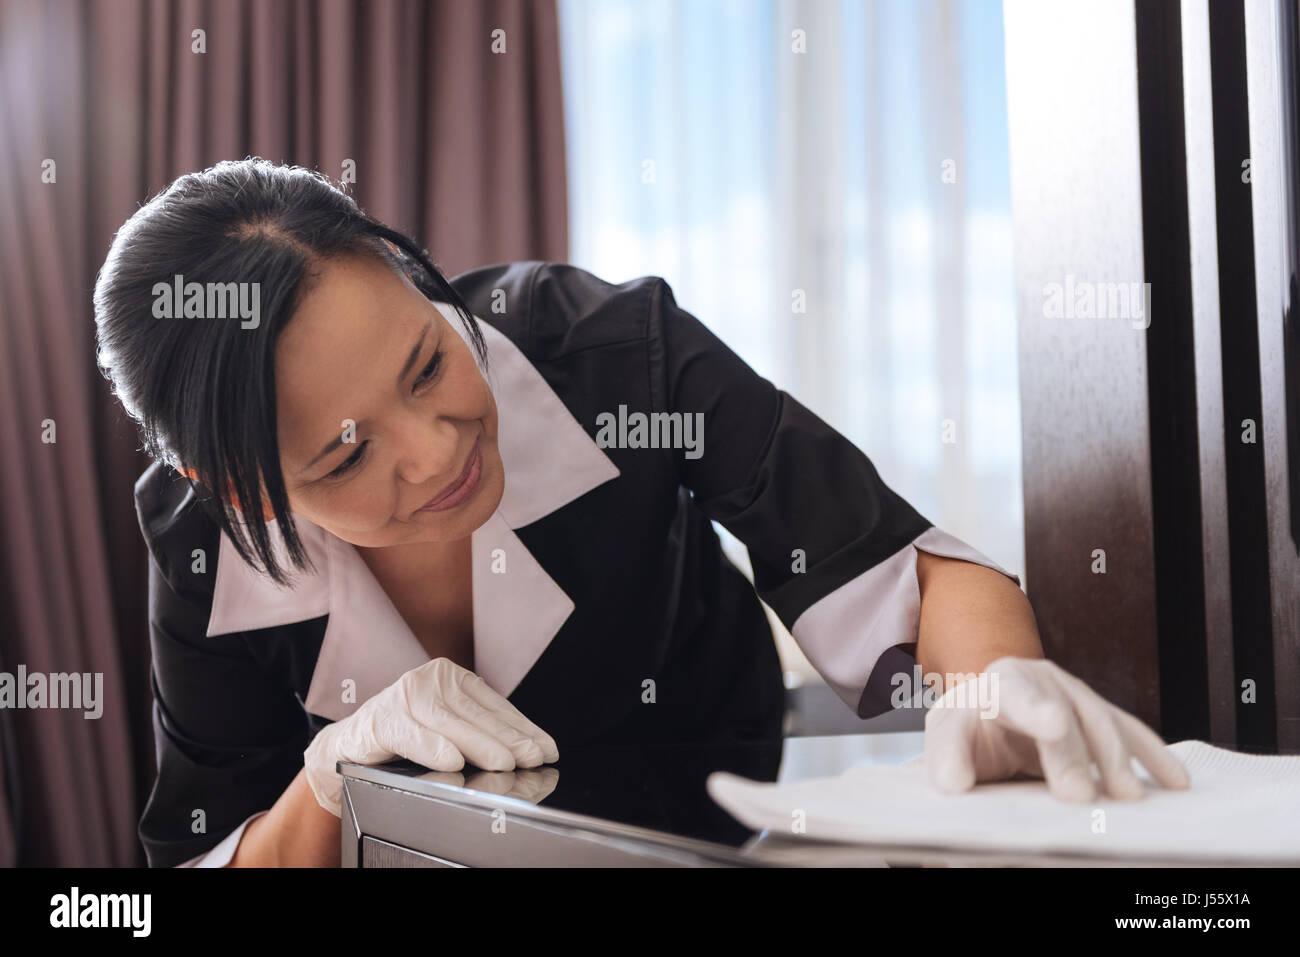 Bonita mujer asiática limpiar la mesa Imagen De Stock